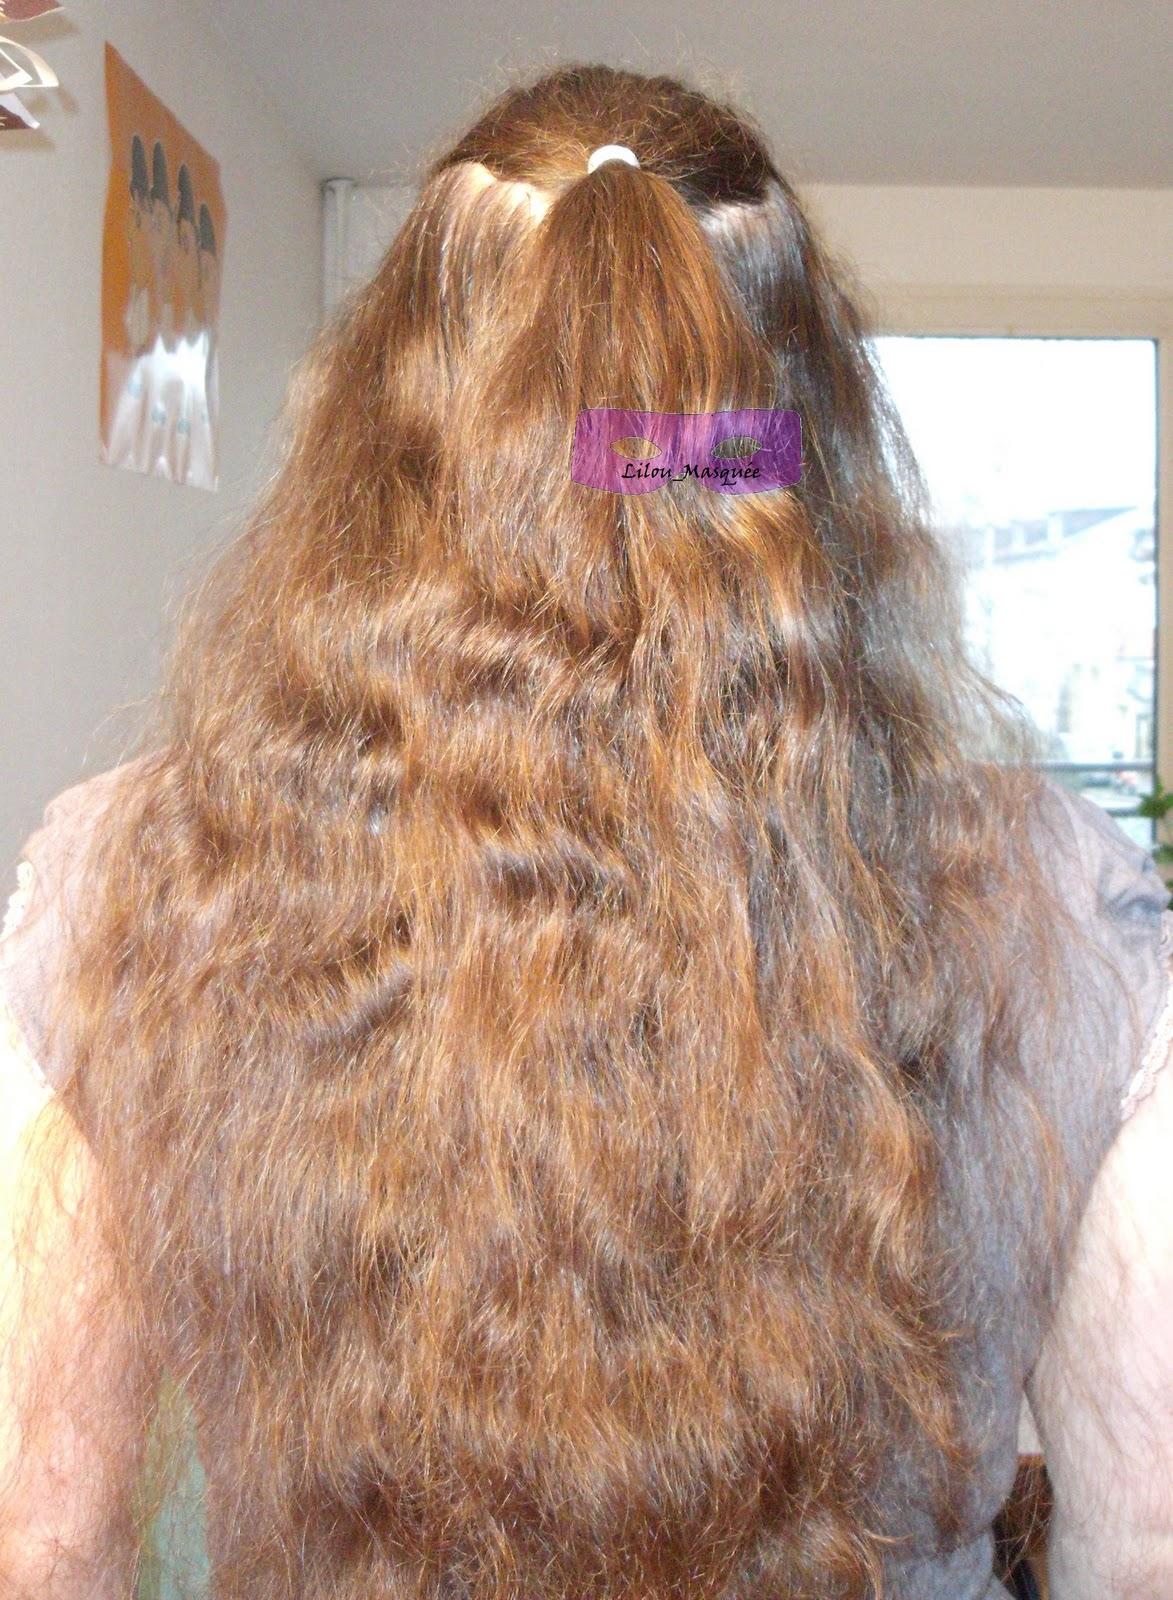 1001 coiffures tuto coiffure variante de la tresse indienne. Black Bedroom Furniture Sets. Home Design Ideas